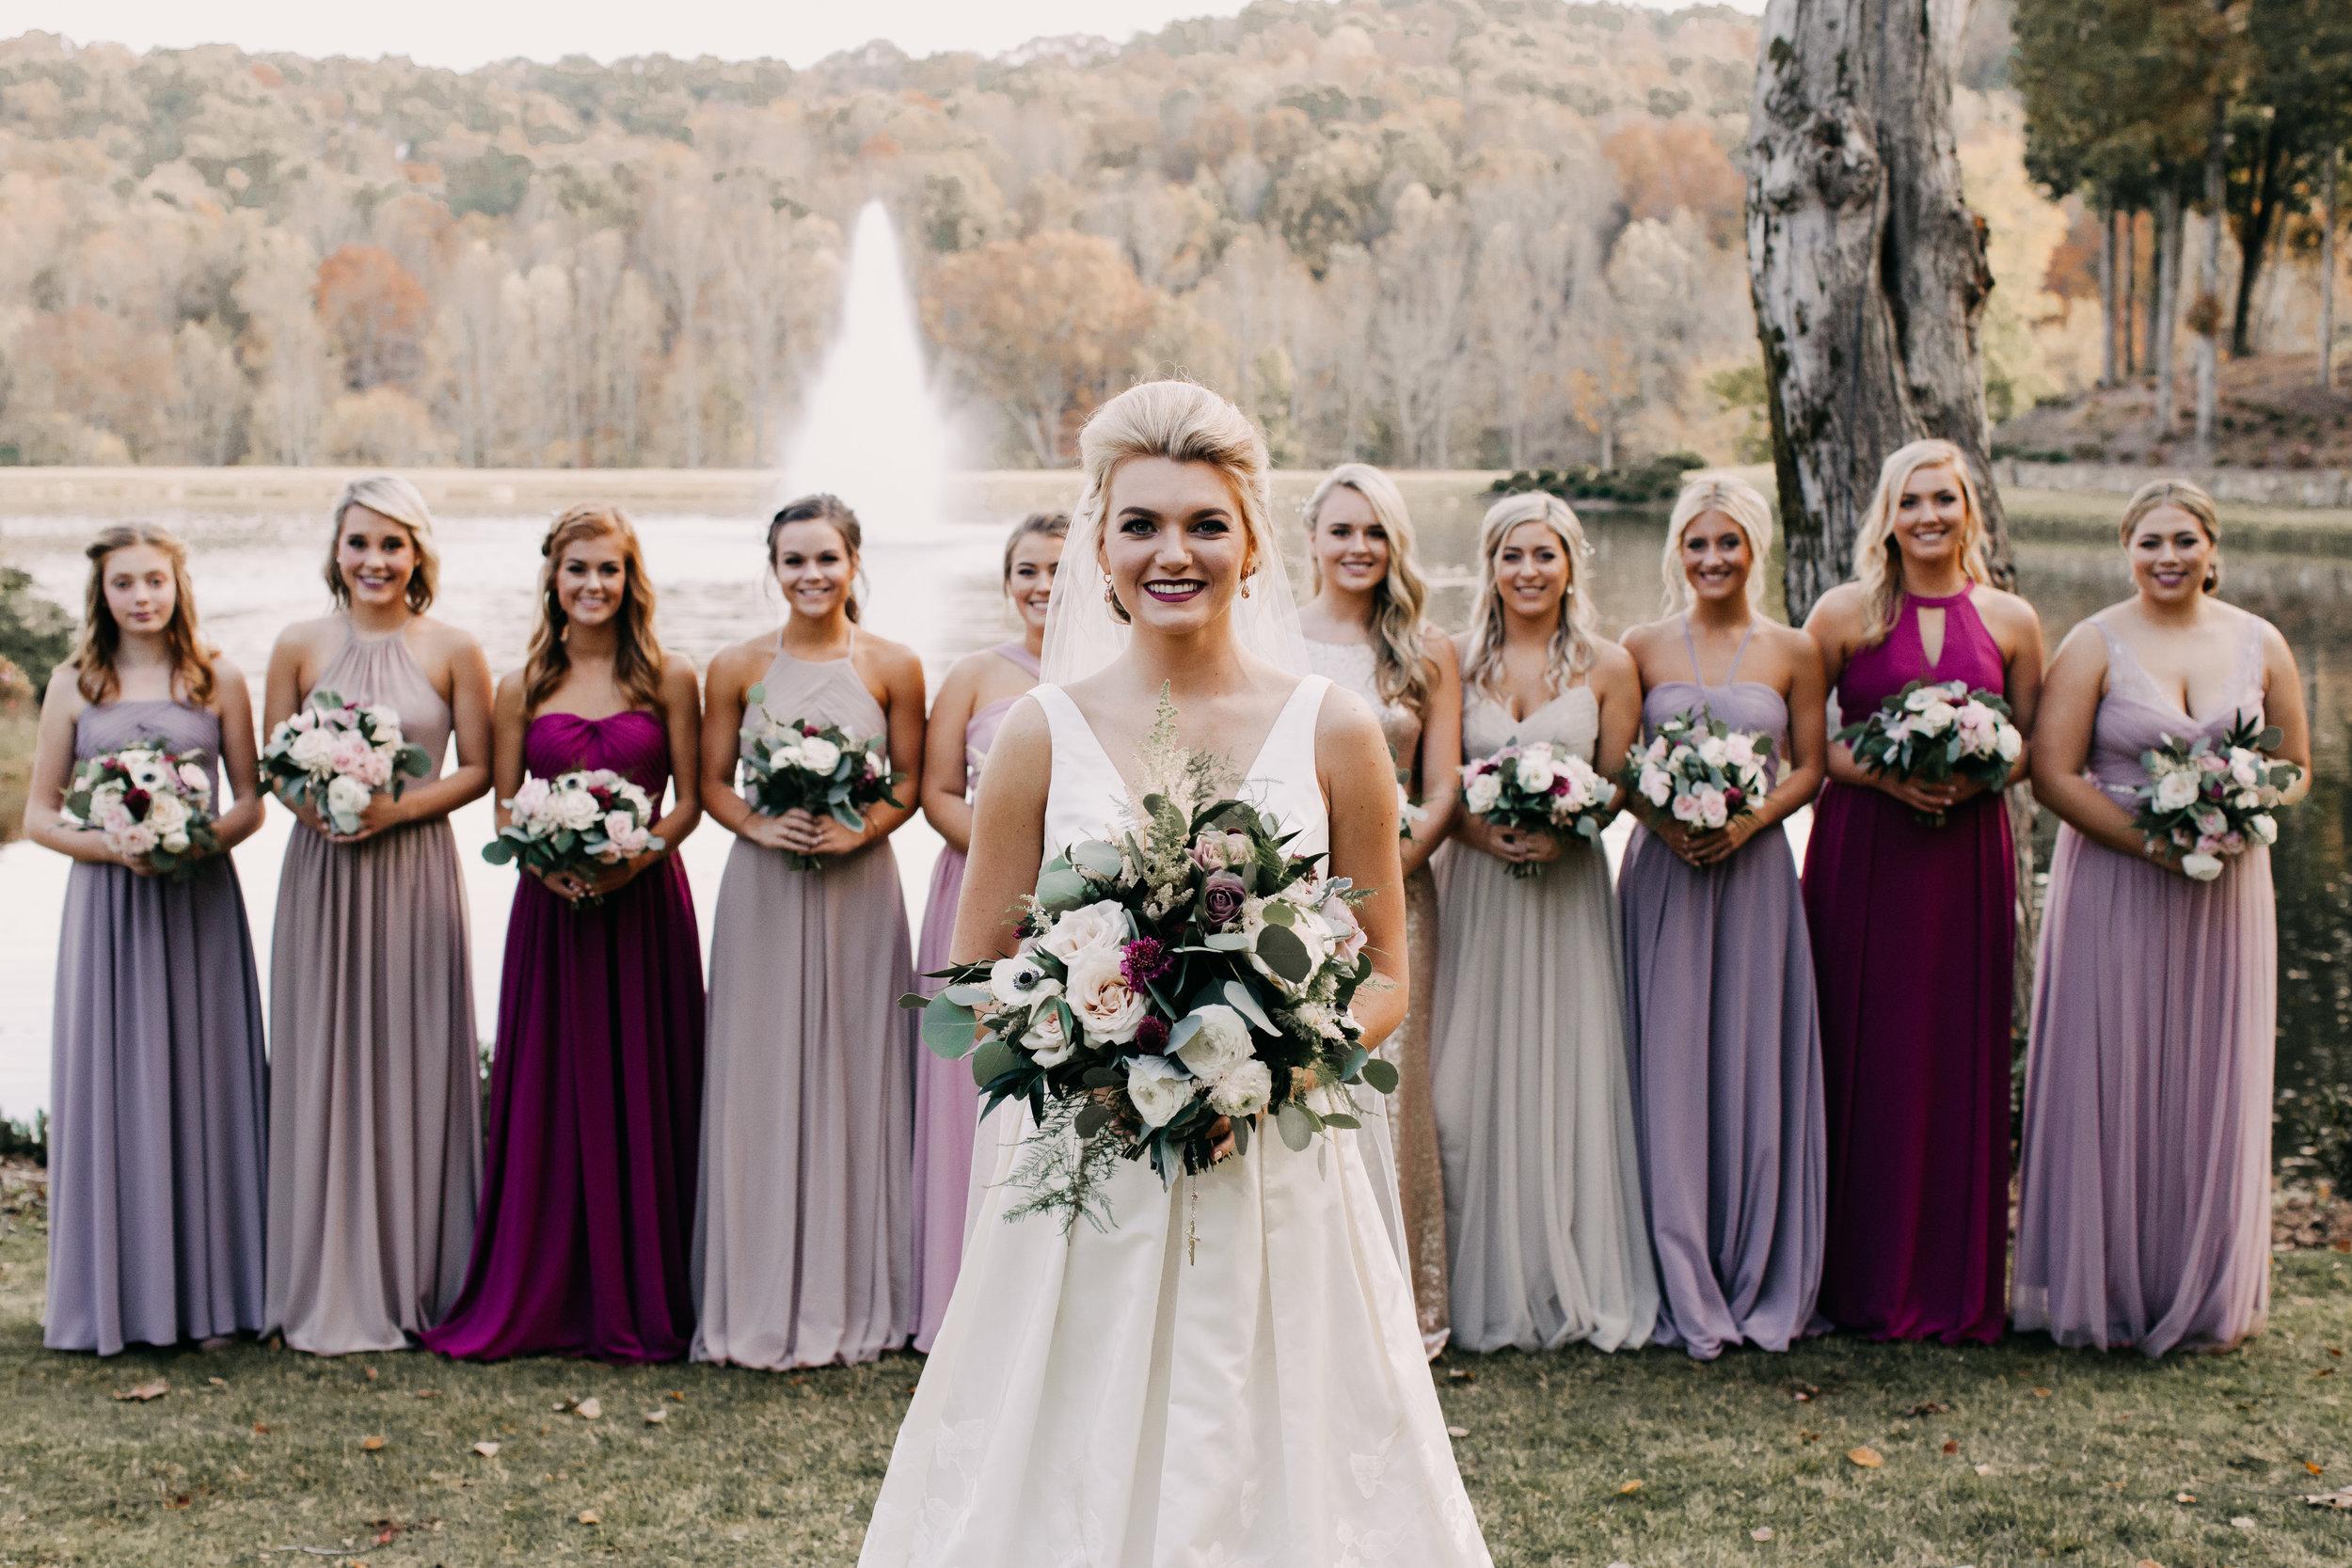 Kaylyn & Ryan Final Wedding Photos95.jpg